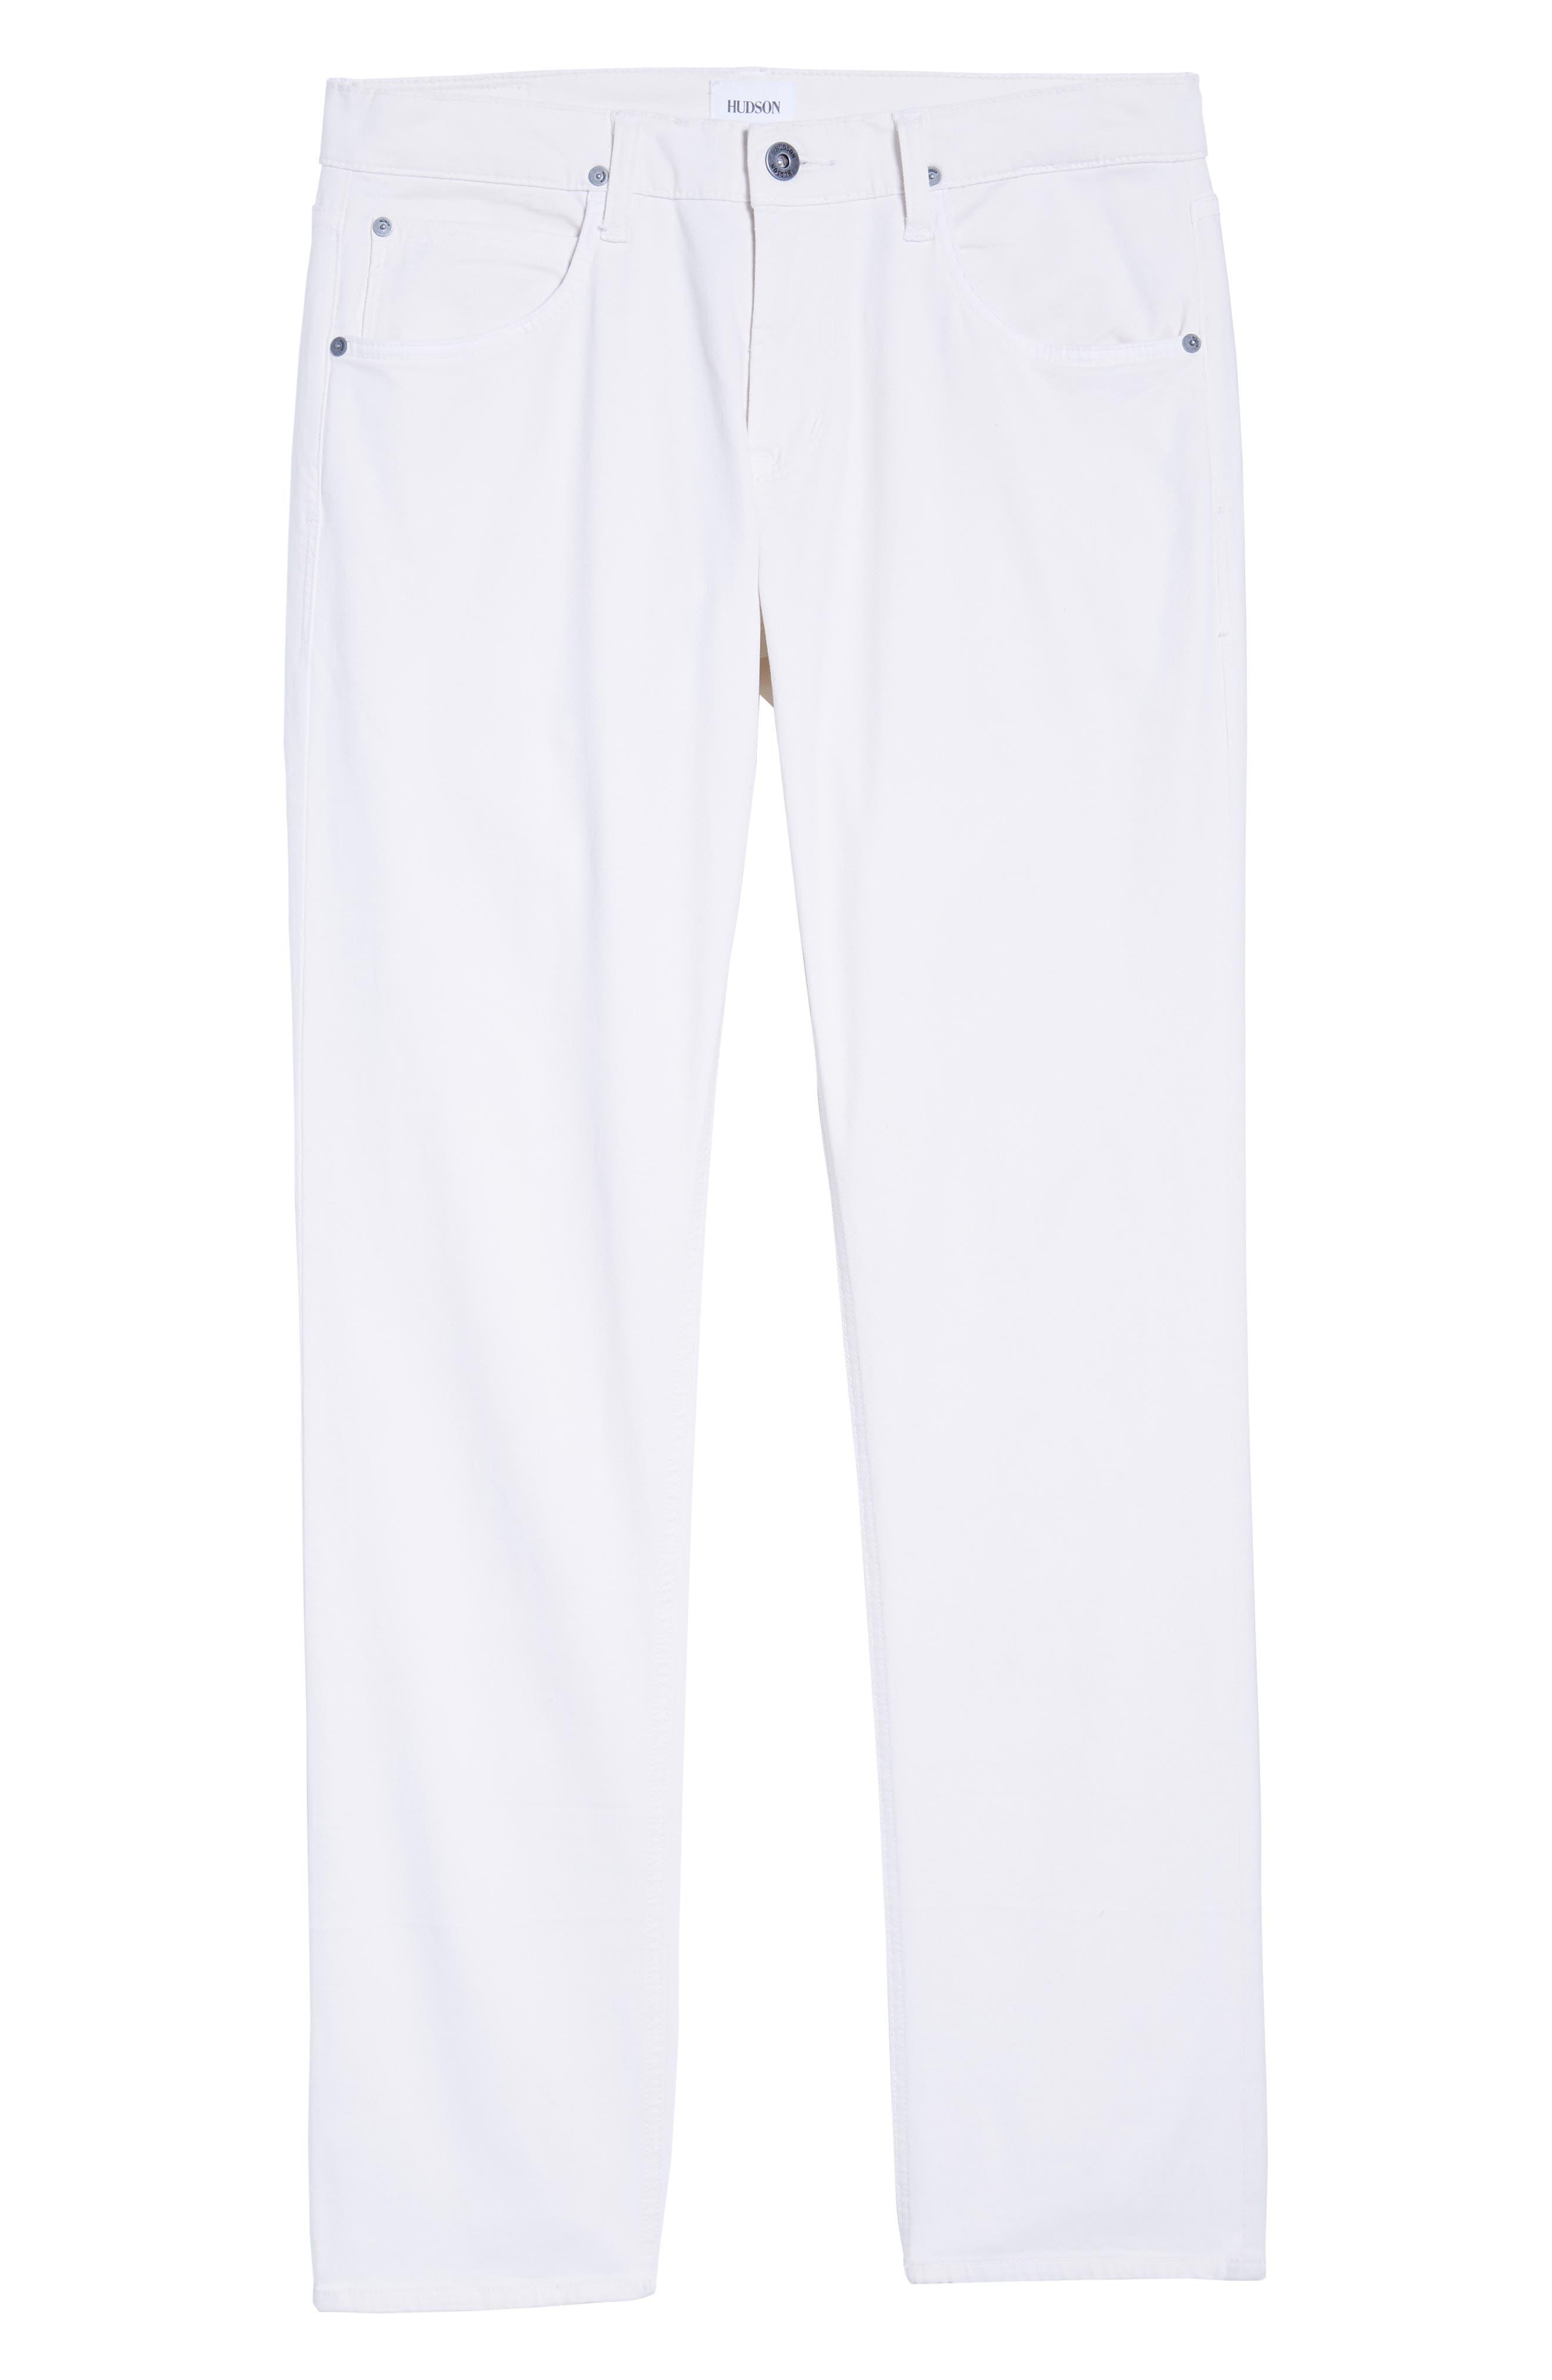 Blake Slim Fit Jeans,                             Alternate thumbnail 7, color,                             Off White